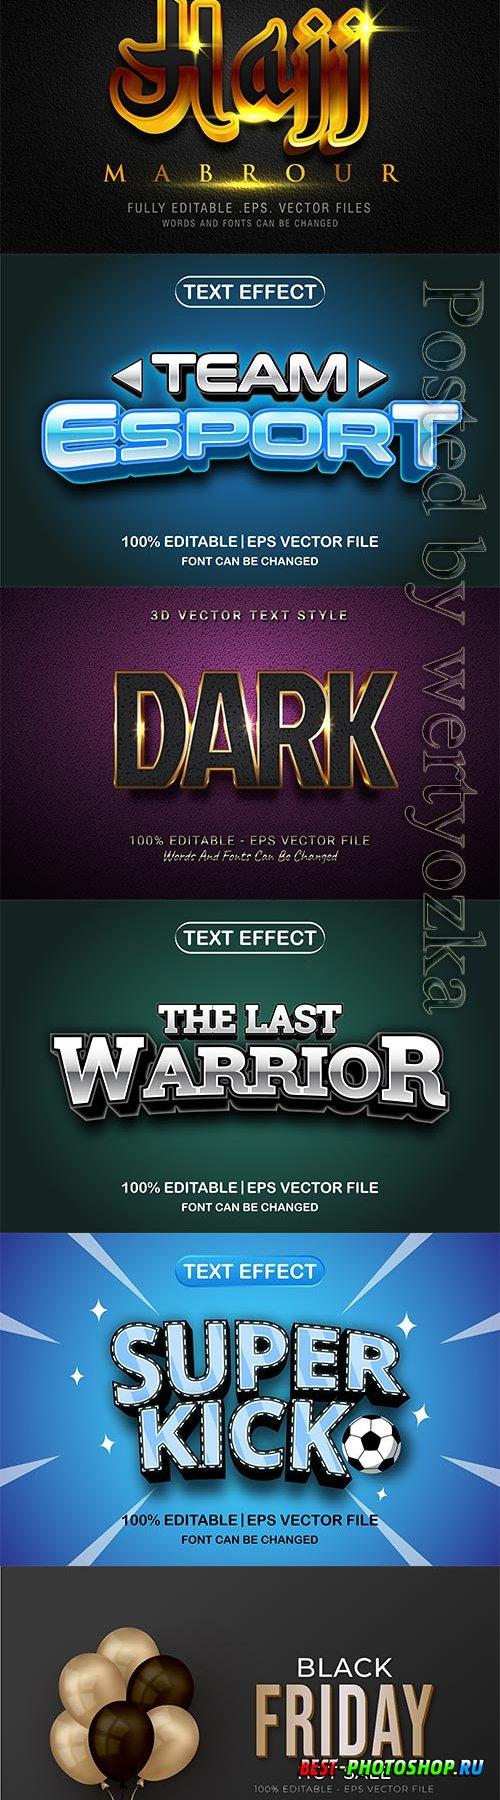 3d editable text style effect vector vol 639